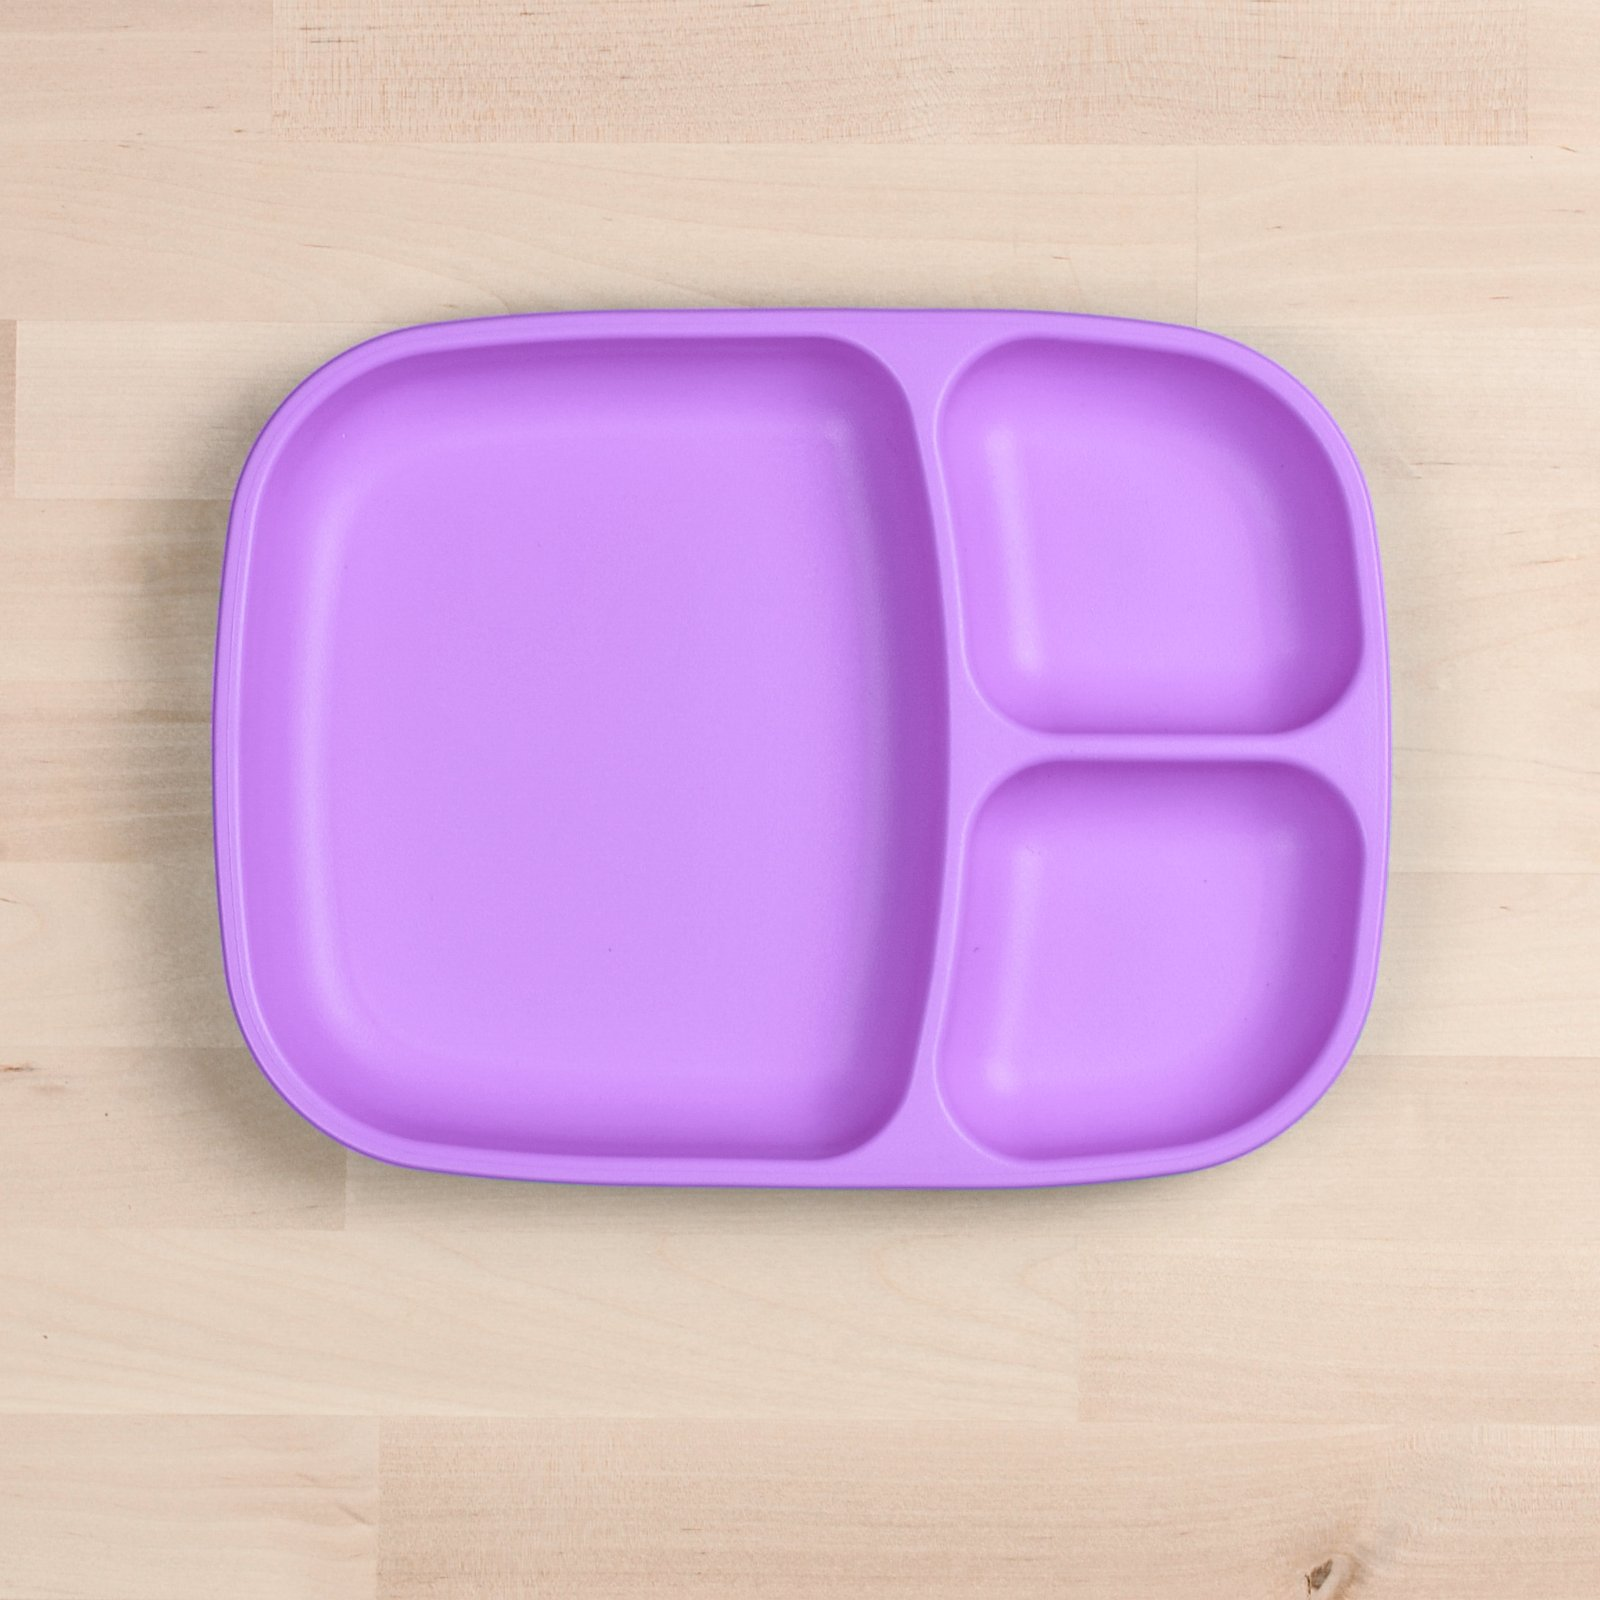 REPLAY plato grande divisiones violeta